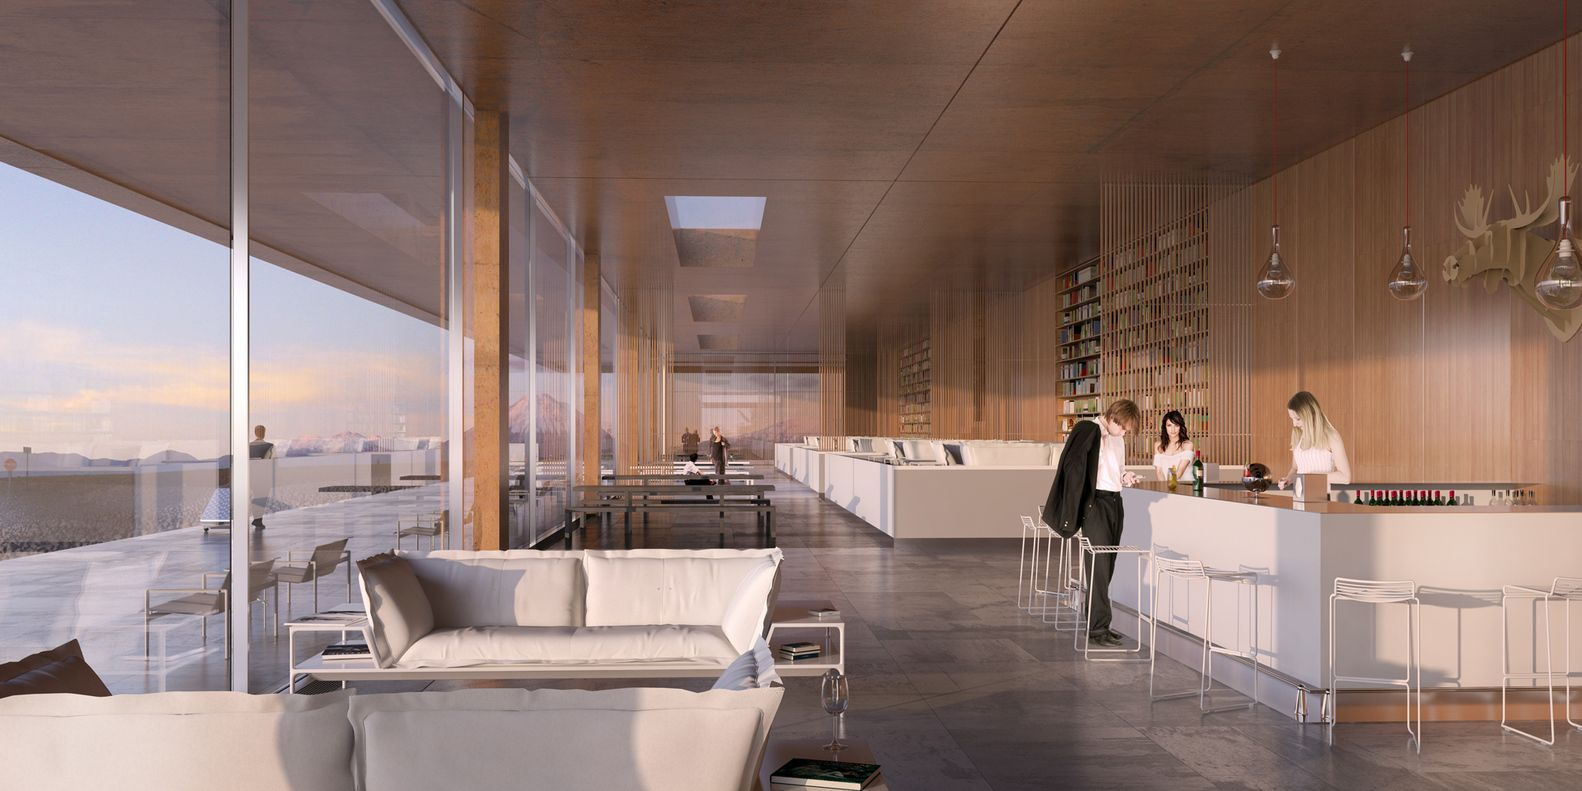 Alma Hotel proposal / LAN Architecture,Courtesy of LAN Architecture